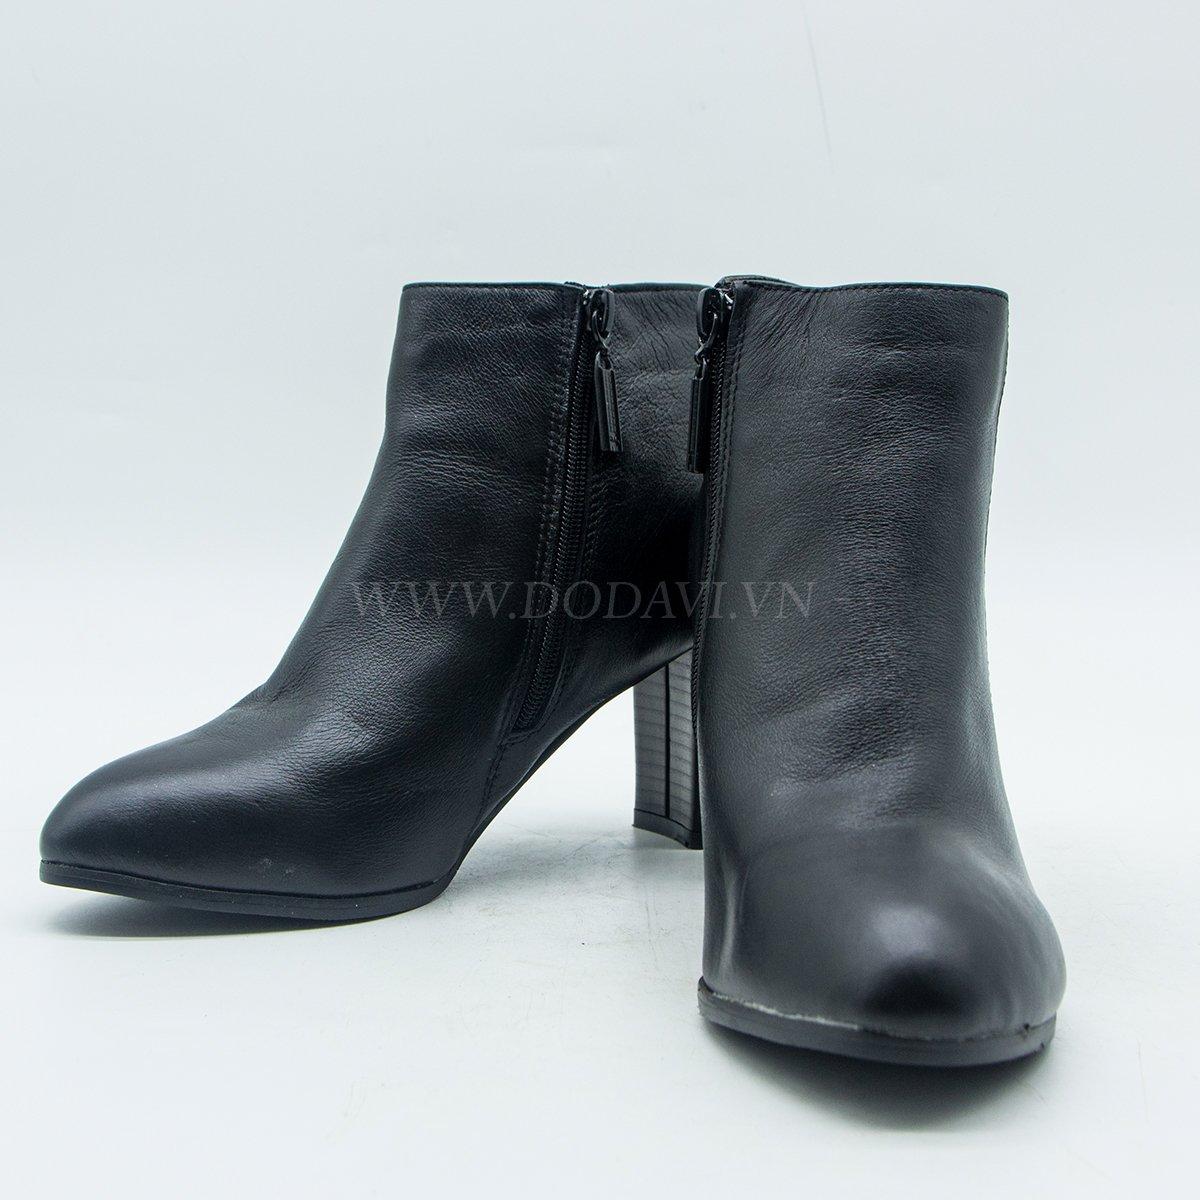 Boot da nữ cổ thấp BD13-1